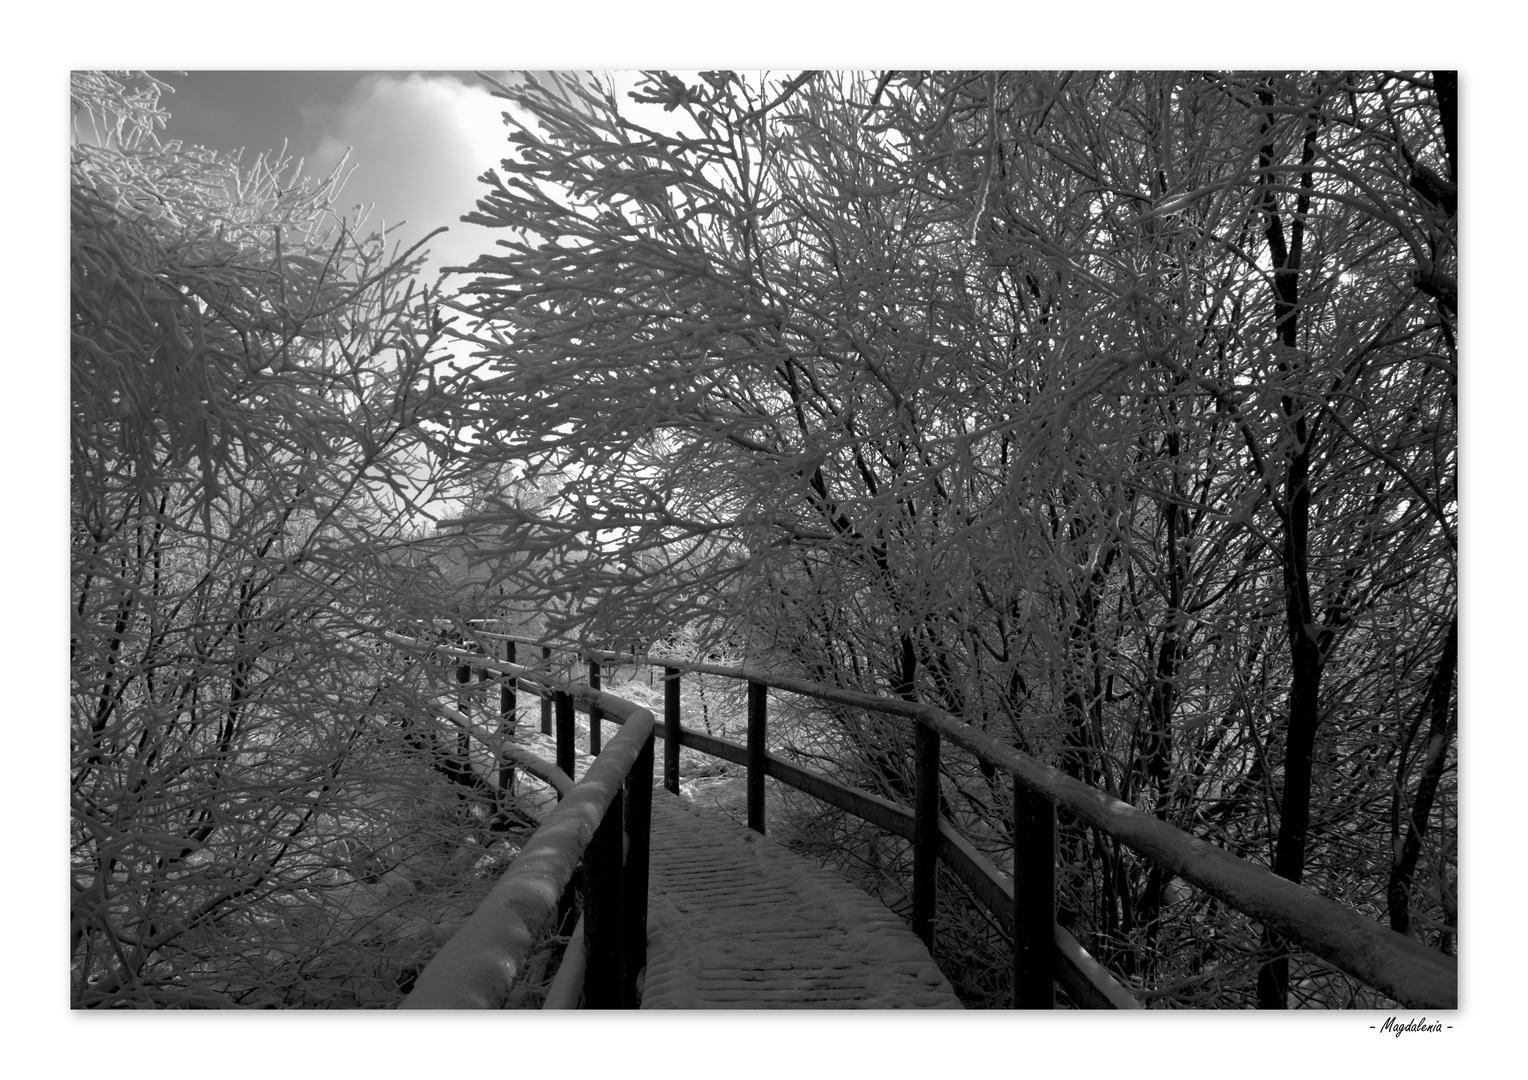 Balade en noir et blanc